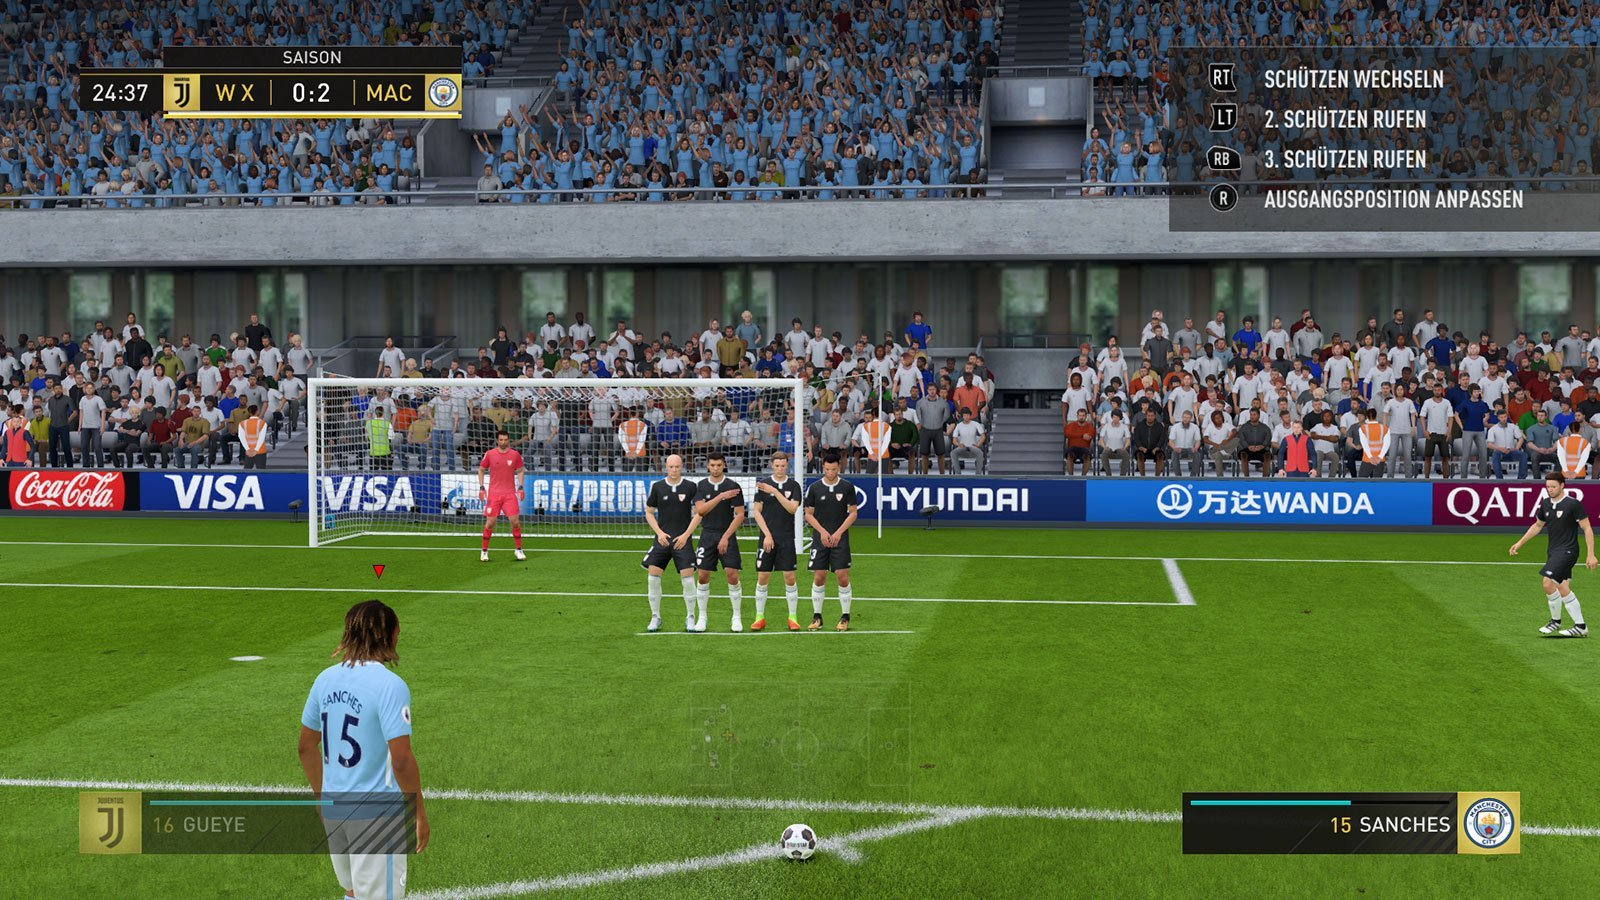 FIFA 18 Screenshot 2017.10.01 02.31.20